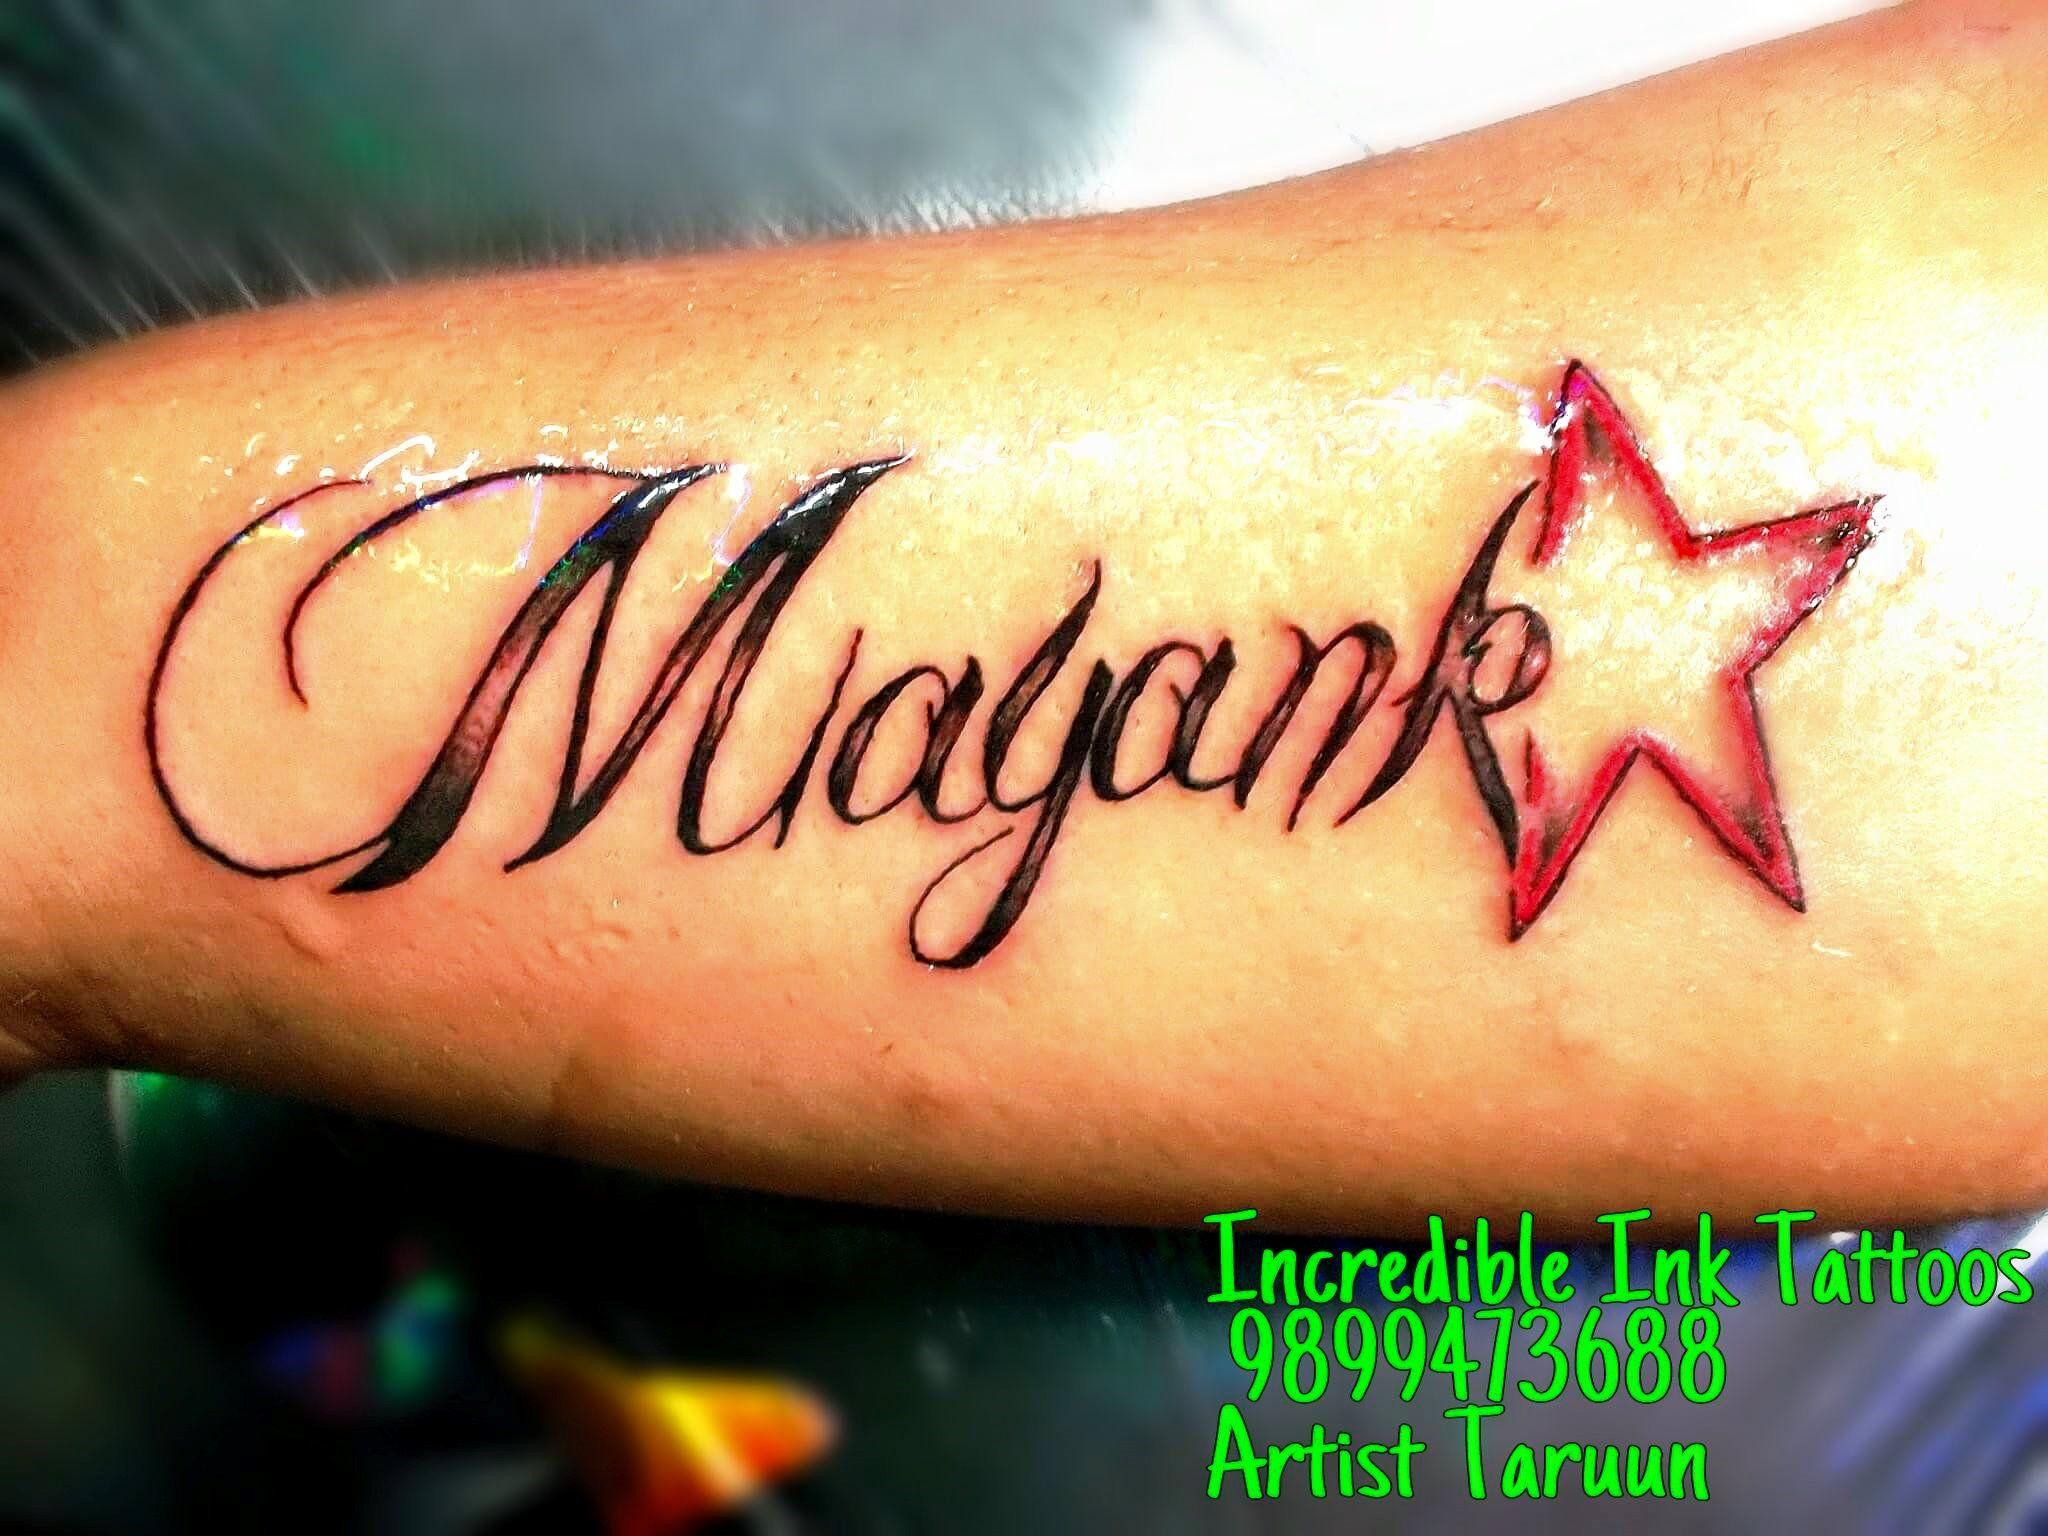 #Mayank #Star #Name # Tattoo Incredible Ink Tattoos and ...